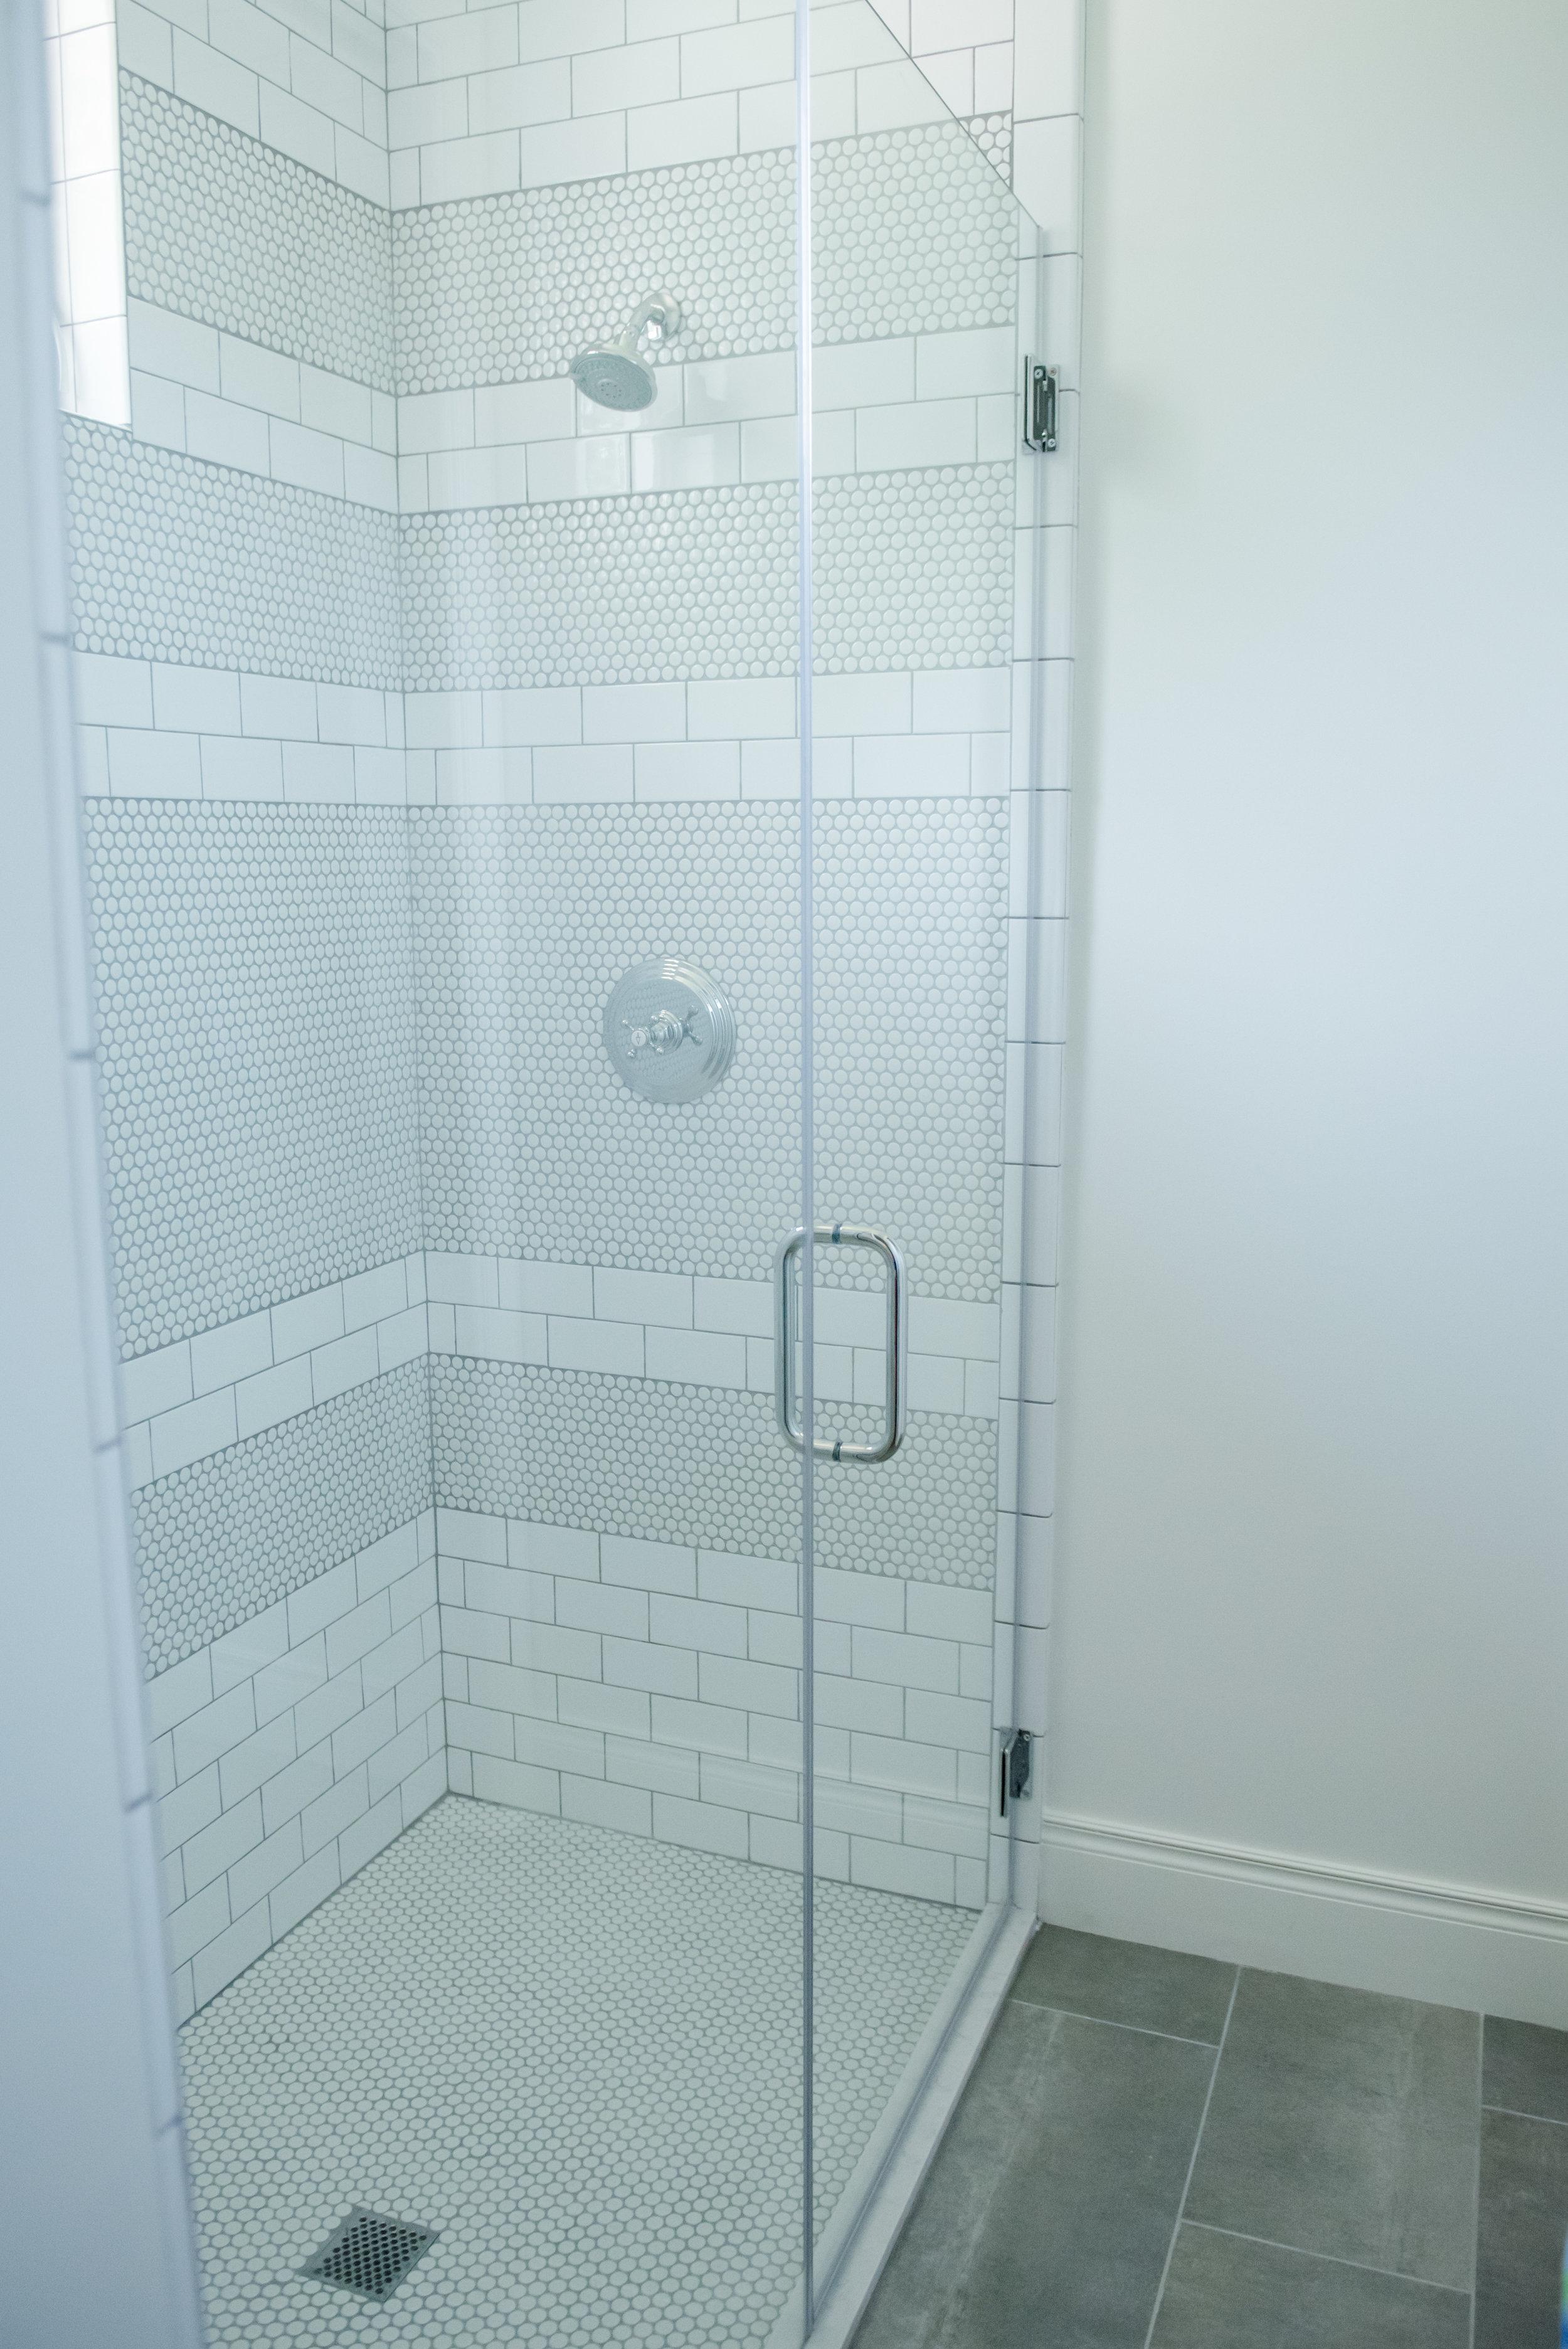 51+Bath+Tile+Subway+Pennytile+Gray+White+Transitional.jpg